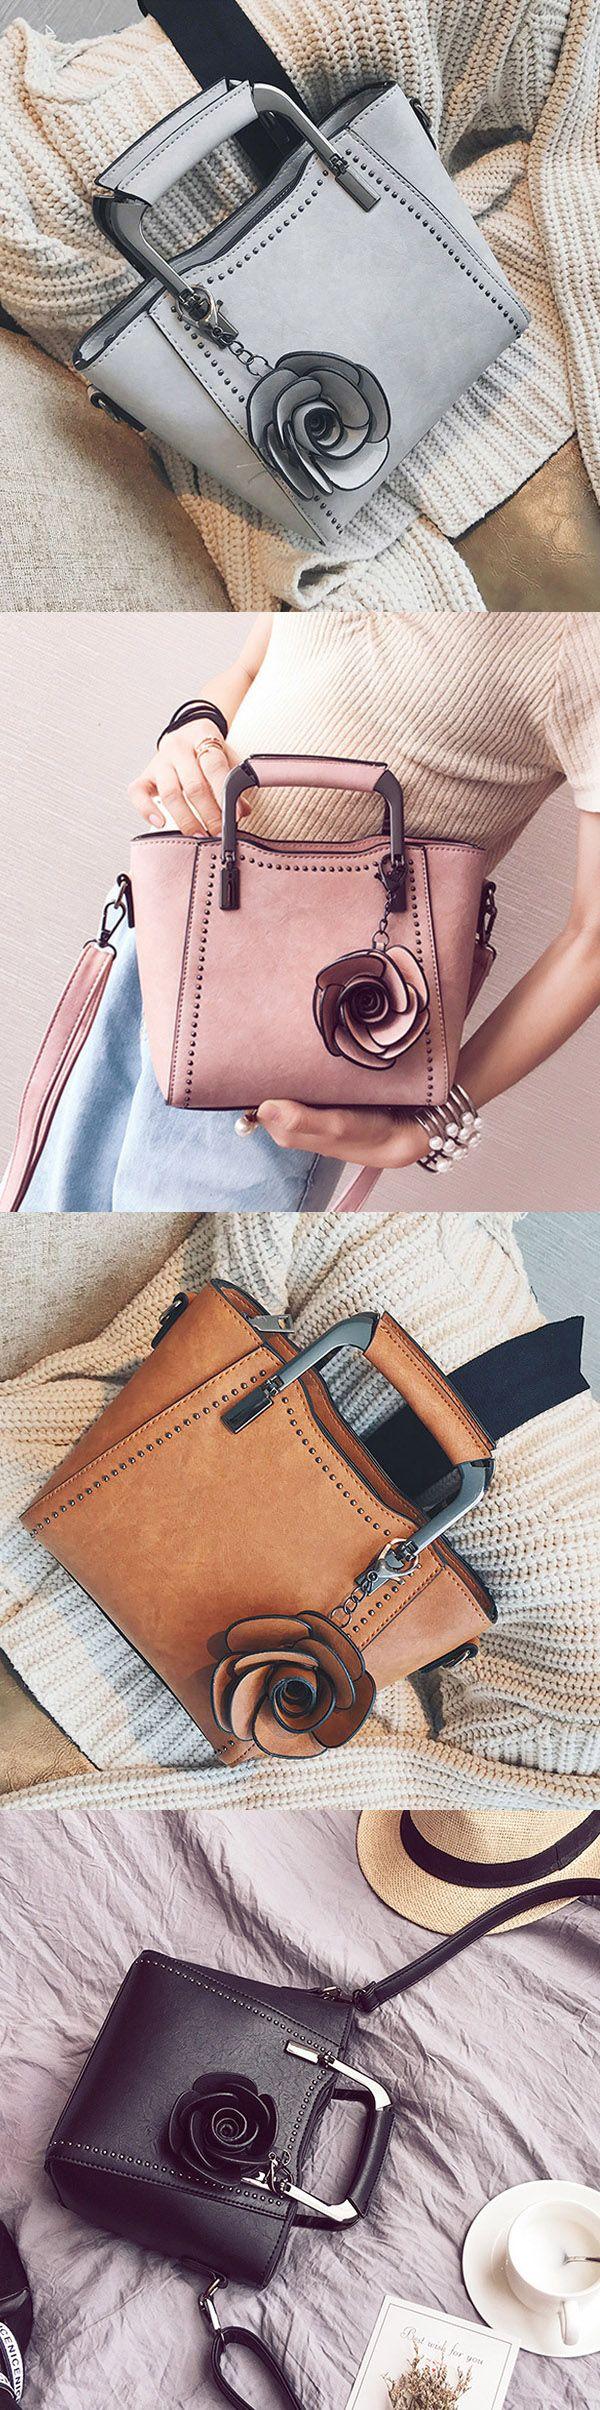 US$26.26 Women PU Leather Retro Rose Tote Bag Crossbody Bag #fashion #style #womensbags #crossbody #handbags